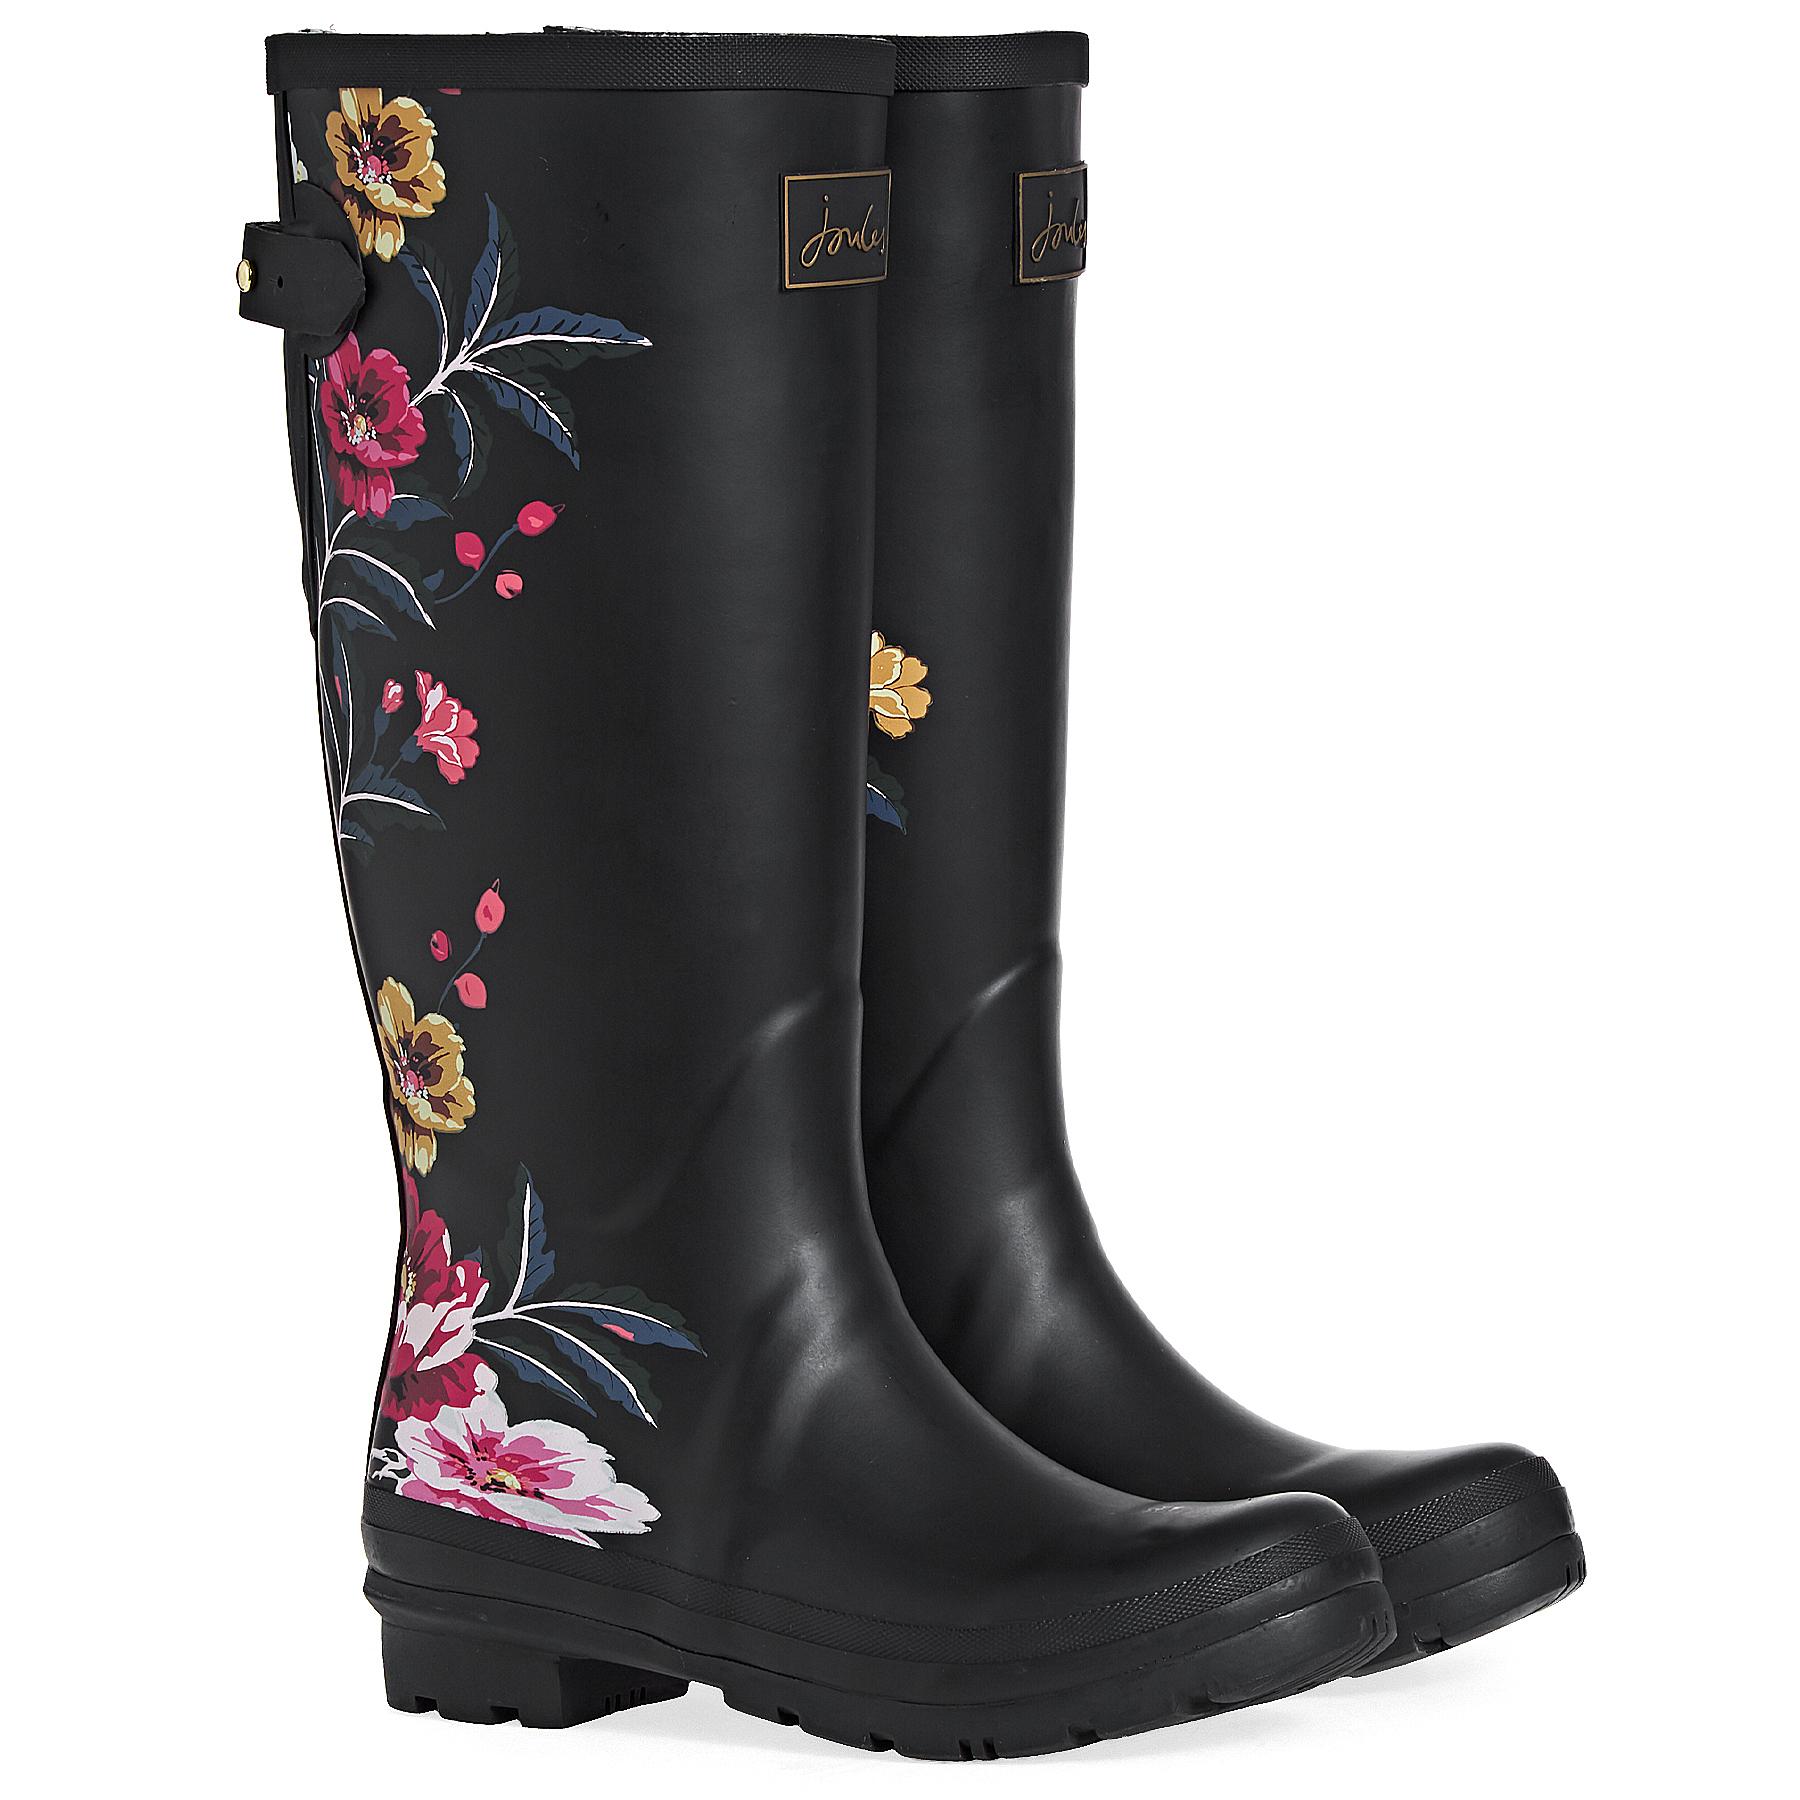 Wellington Boots - Black Border Floral